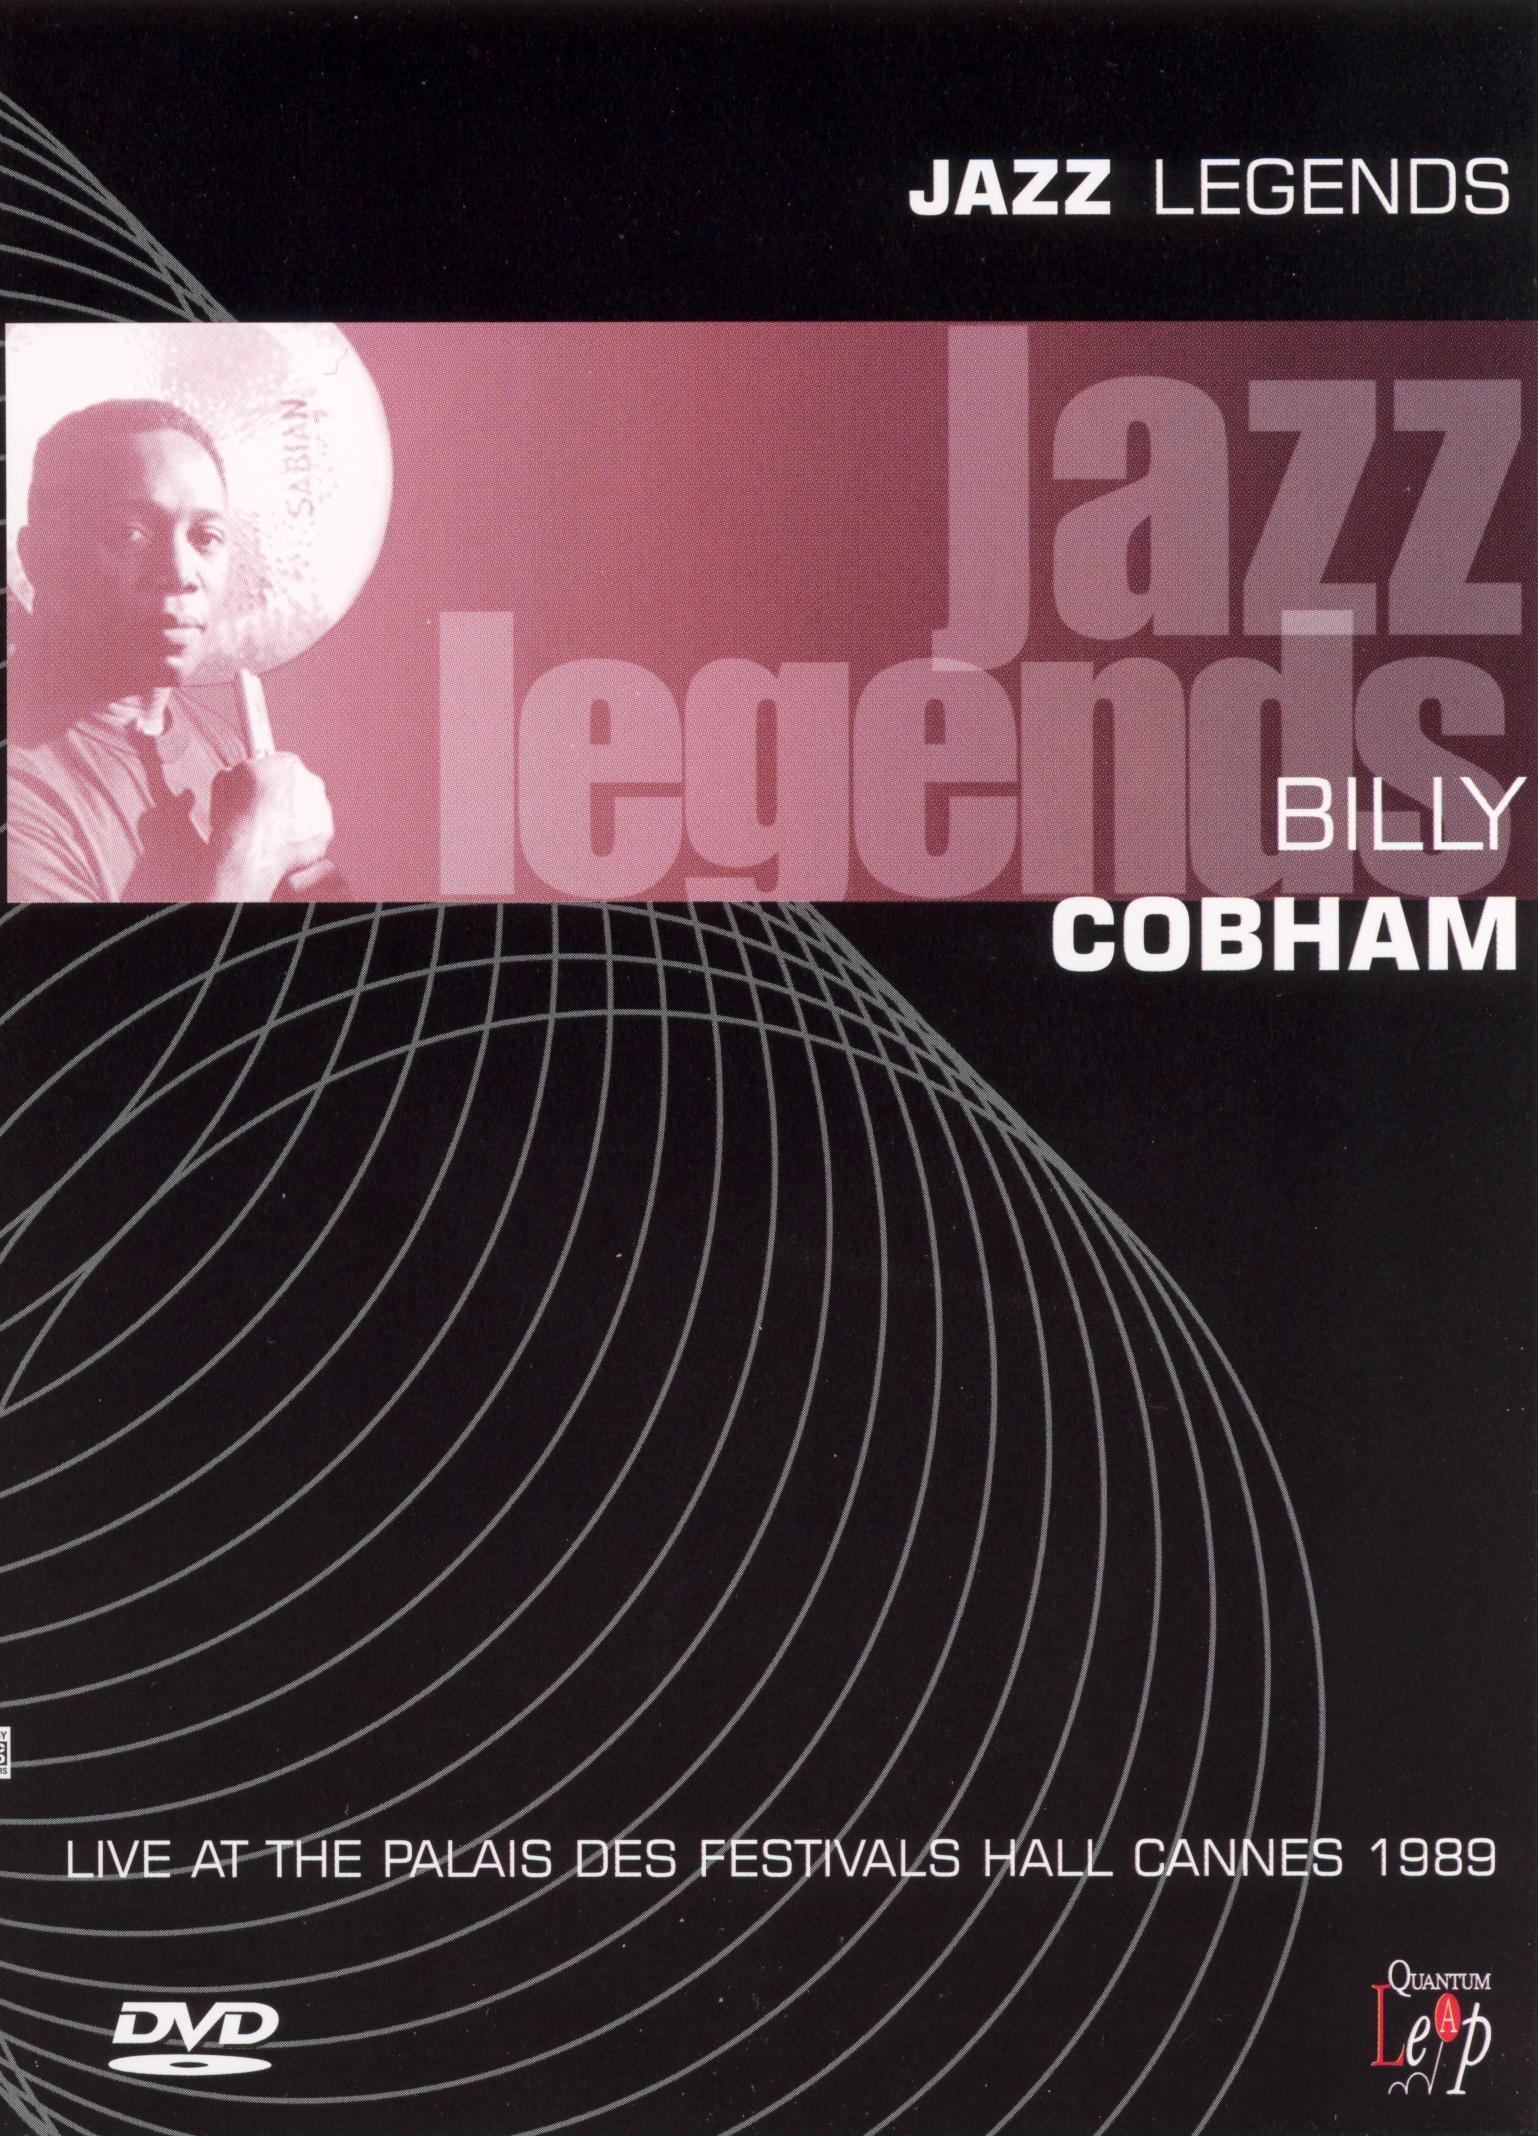 Jazz Legends: Billy Cobham - Live at the Palais des Festivals Hall Cannes 1989